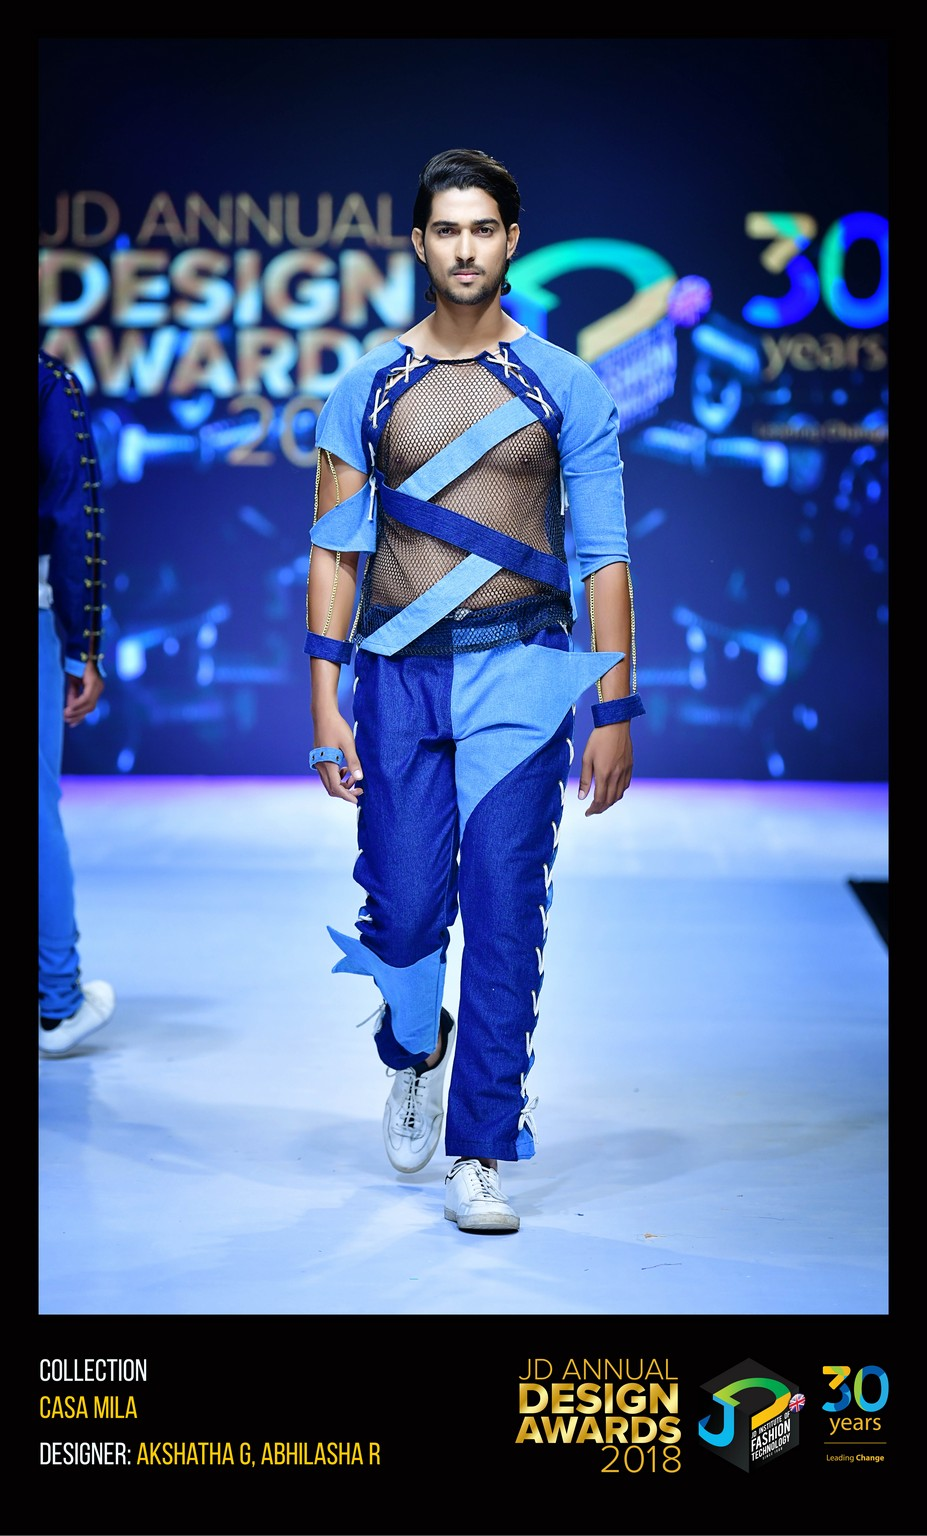 Casa Mila – Change – JD Annual Design Awards 2018 | Designer: Akshata, Sapna and Abhilasha | Photography : Jerin Nath (@jerin_nath) casa mila – change – jd annual design awards 2018 Casa Mila – Change – JD Annual Design Awards 2018 CASA MILA 3